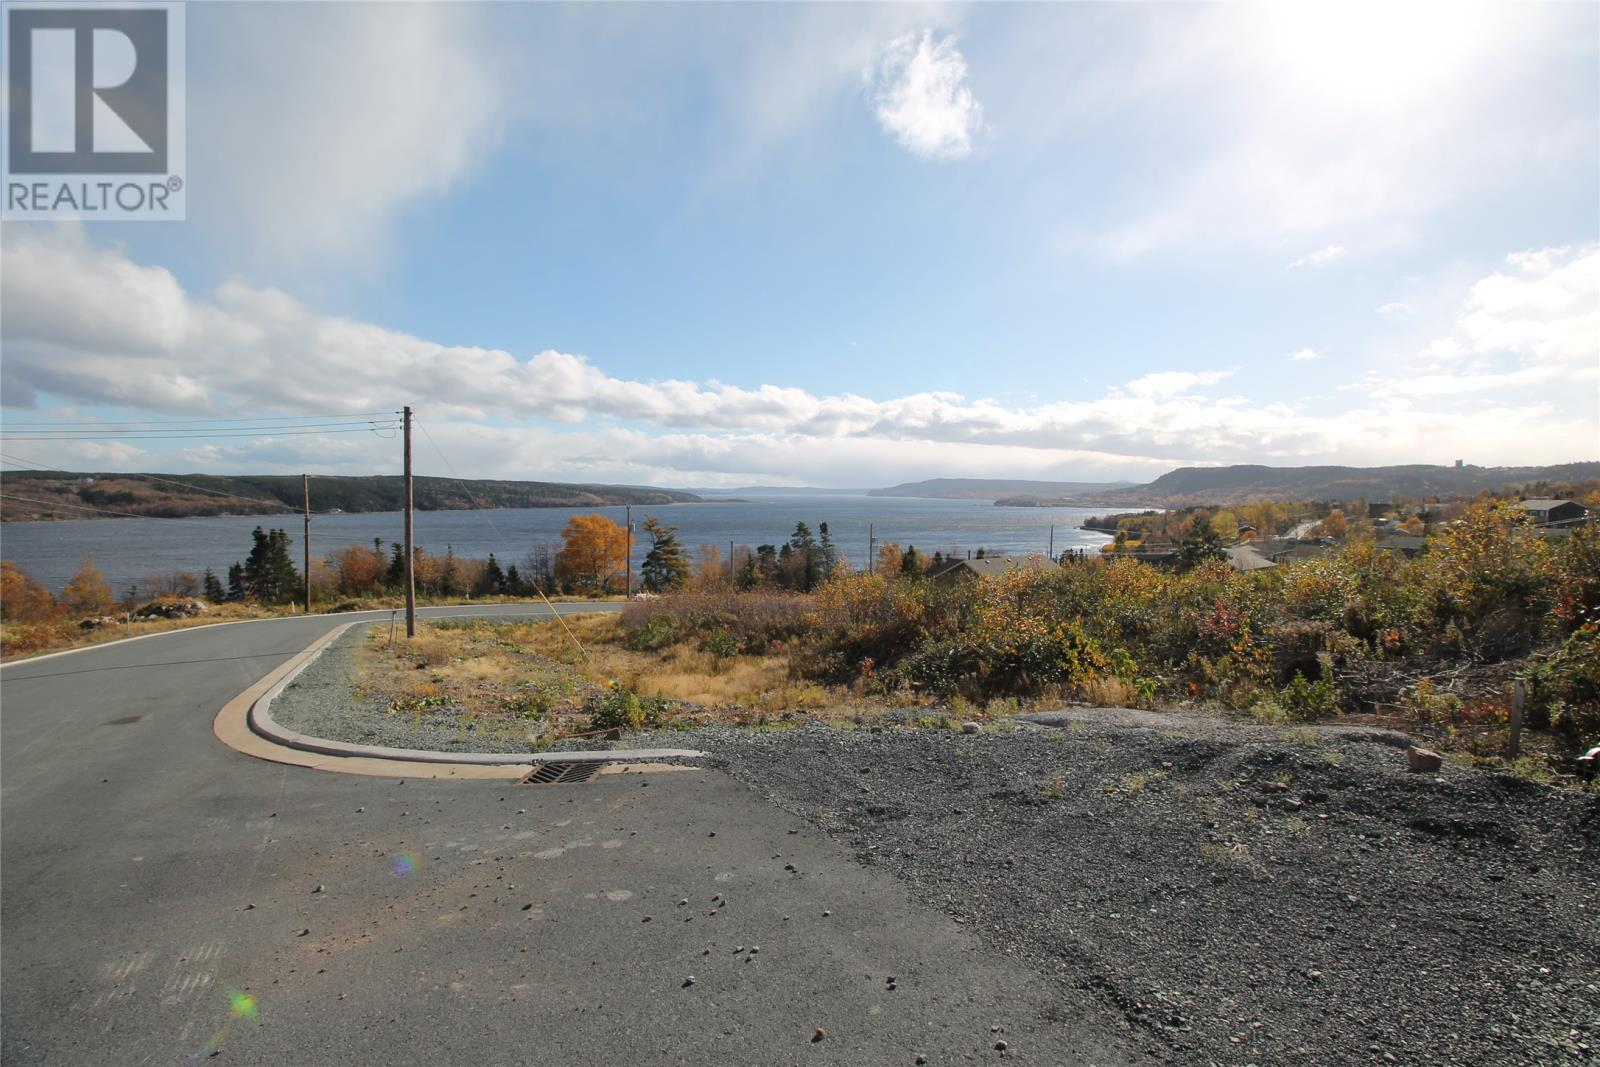 Lot 7 Ridgewood Crescent, Clarenville, Newfoundland & Labrador  A5A 0G3 - Photo 1 - 1186862